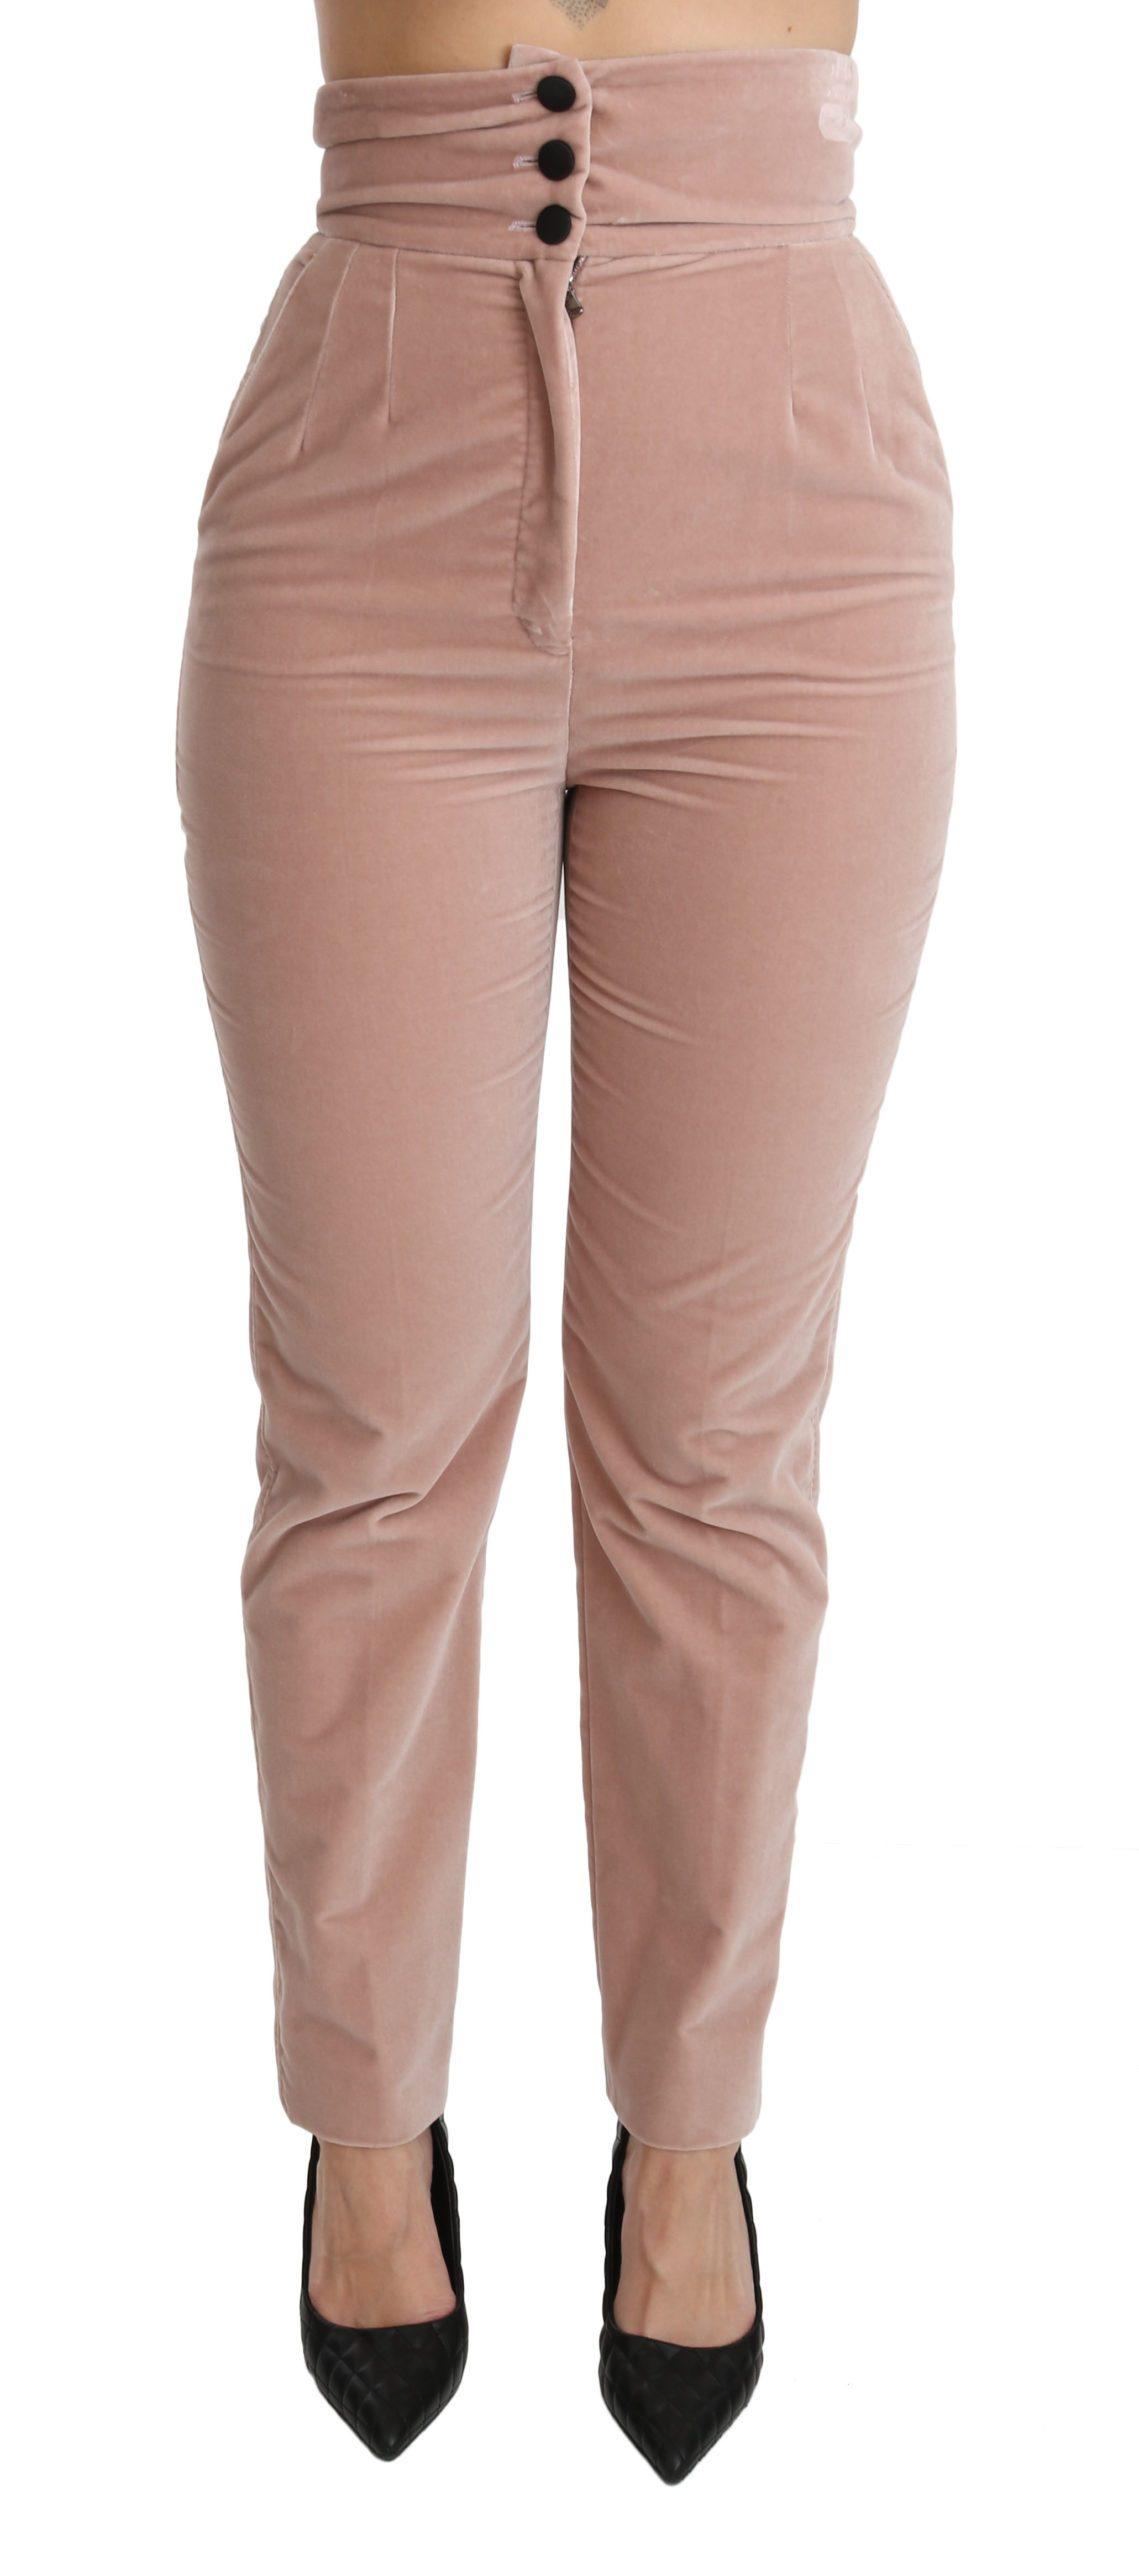 Dolce & Gabbana Women's Slim Fit High Waist Cotton Trouser Pink PAN70851 - IT40|S